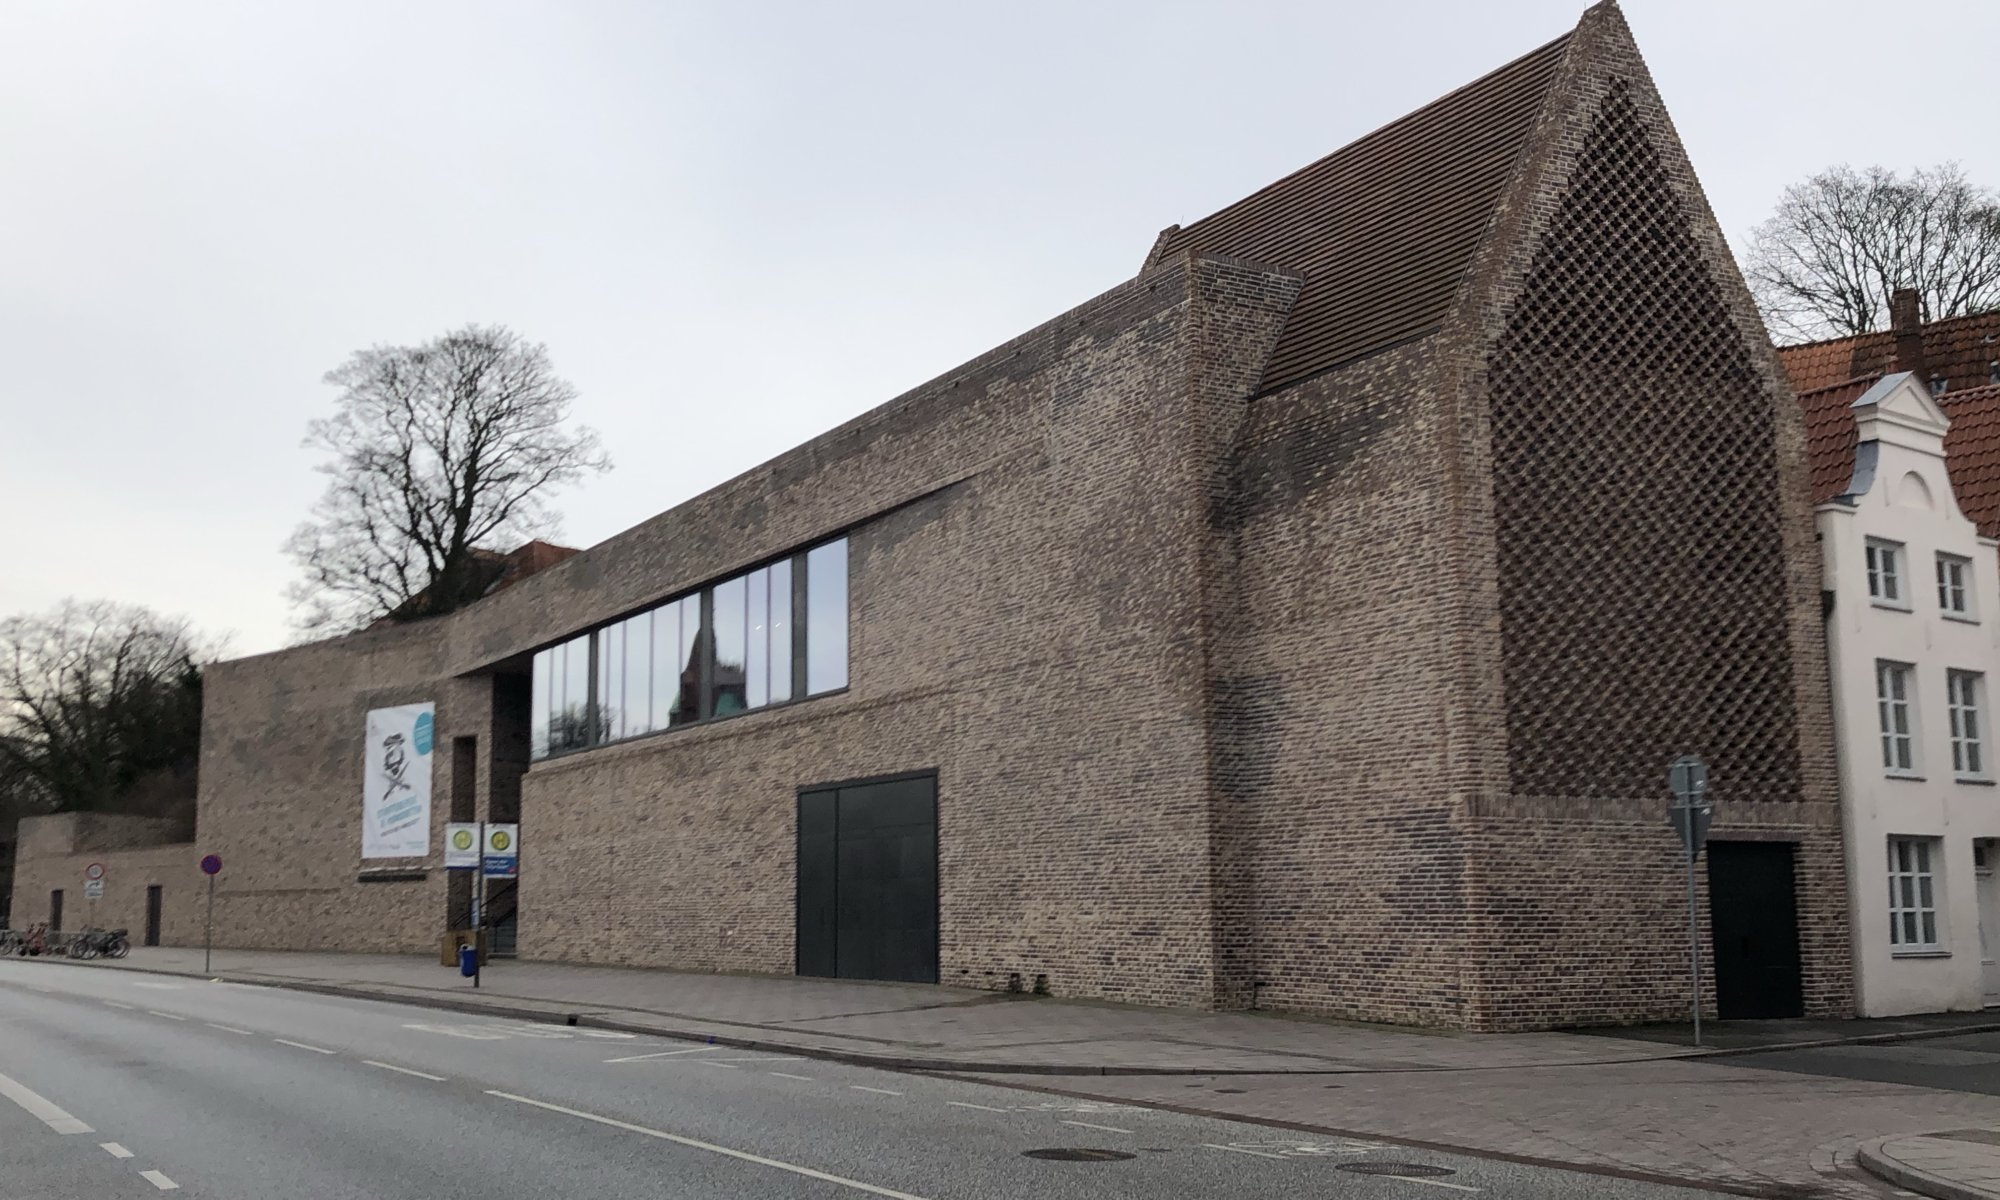 Europäisches Hansemuseum, Lübeck